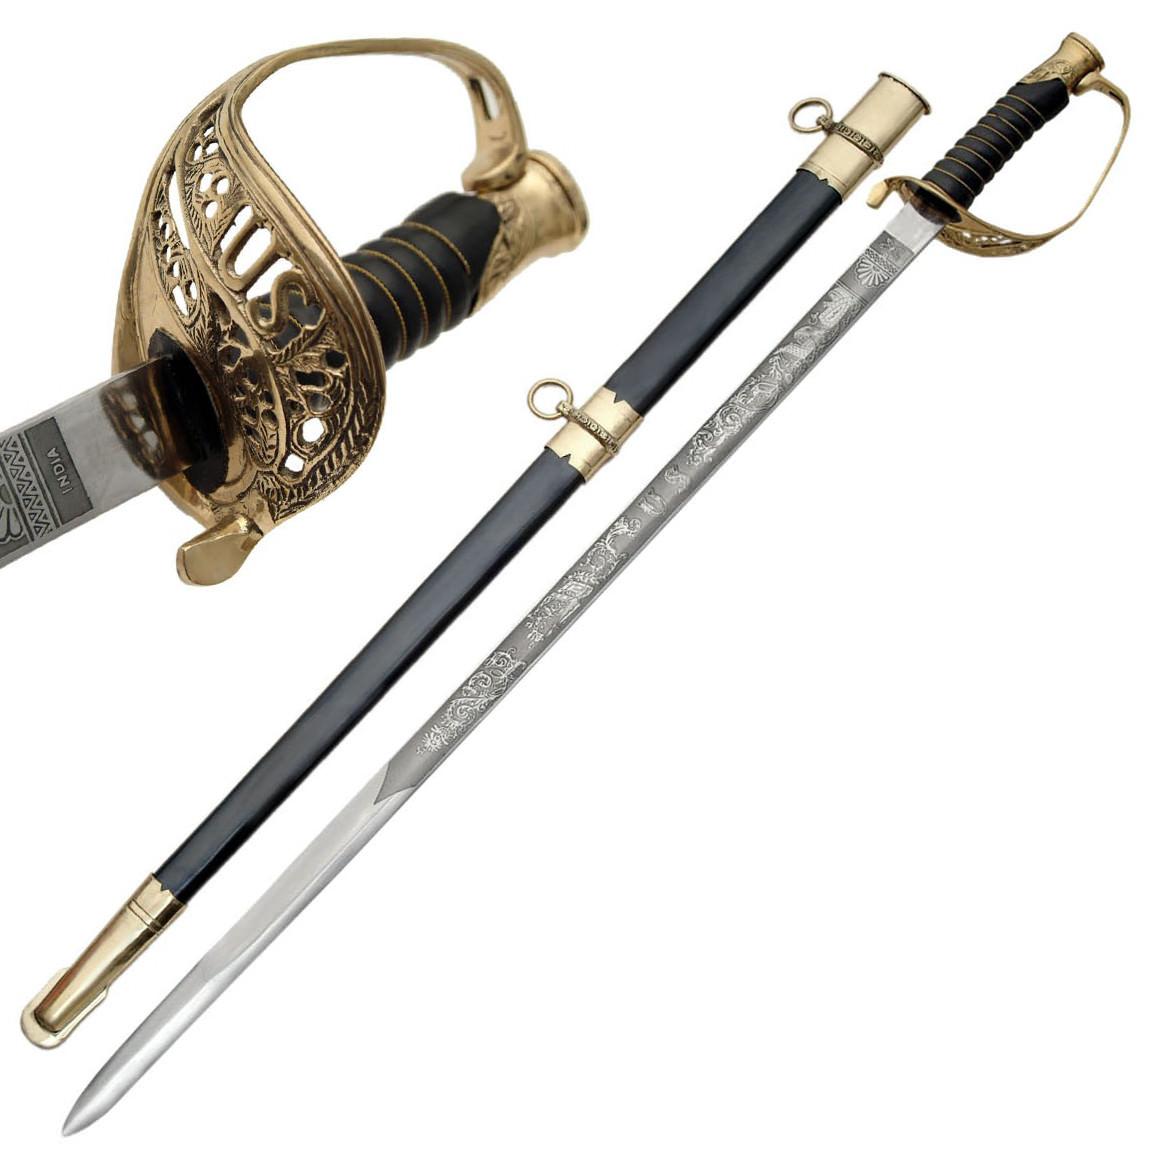 Cavalry Saber U.S. Civil War Foot Officer's Sword  Sabre